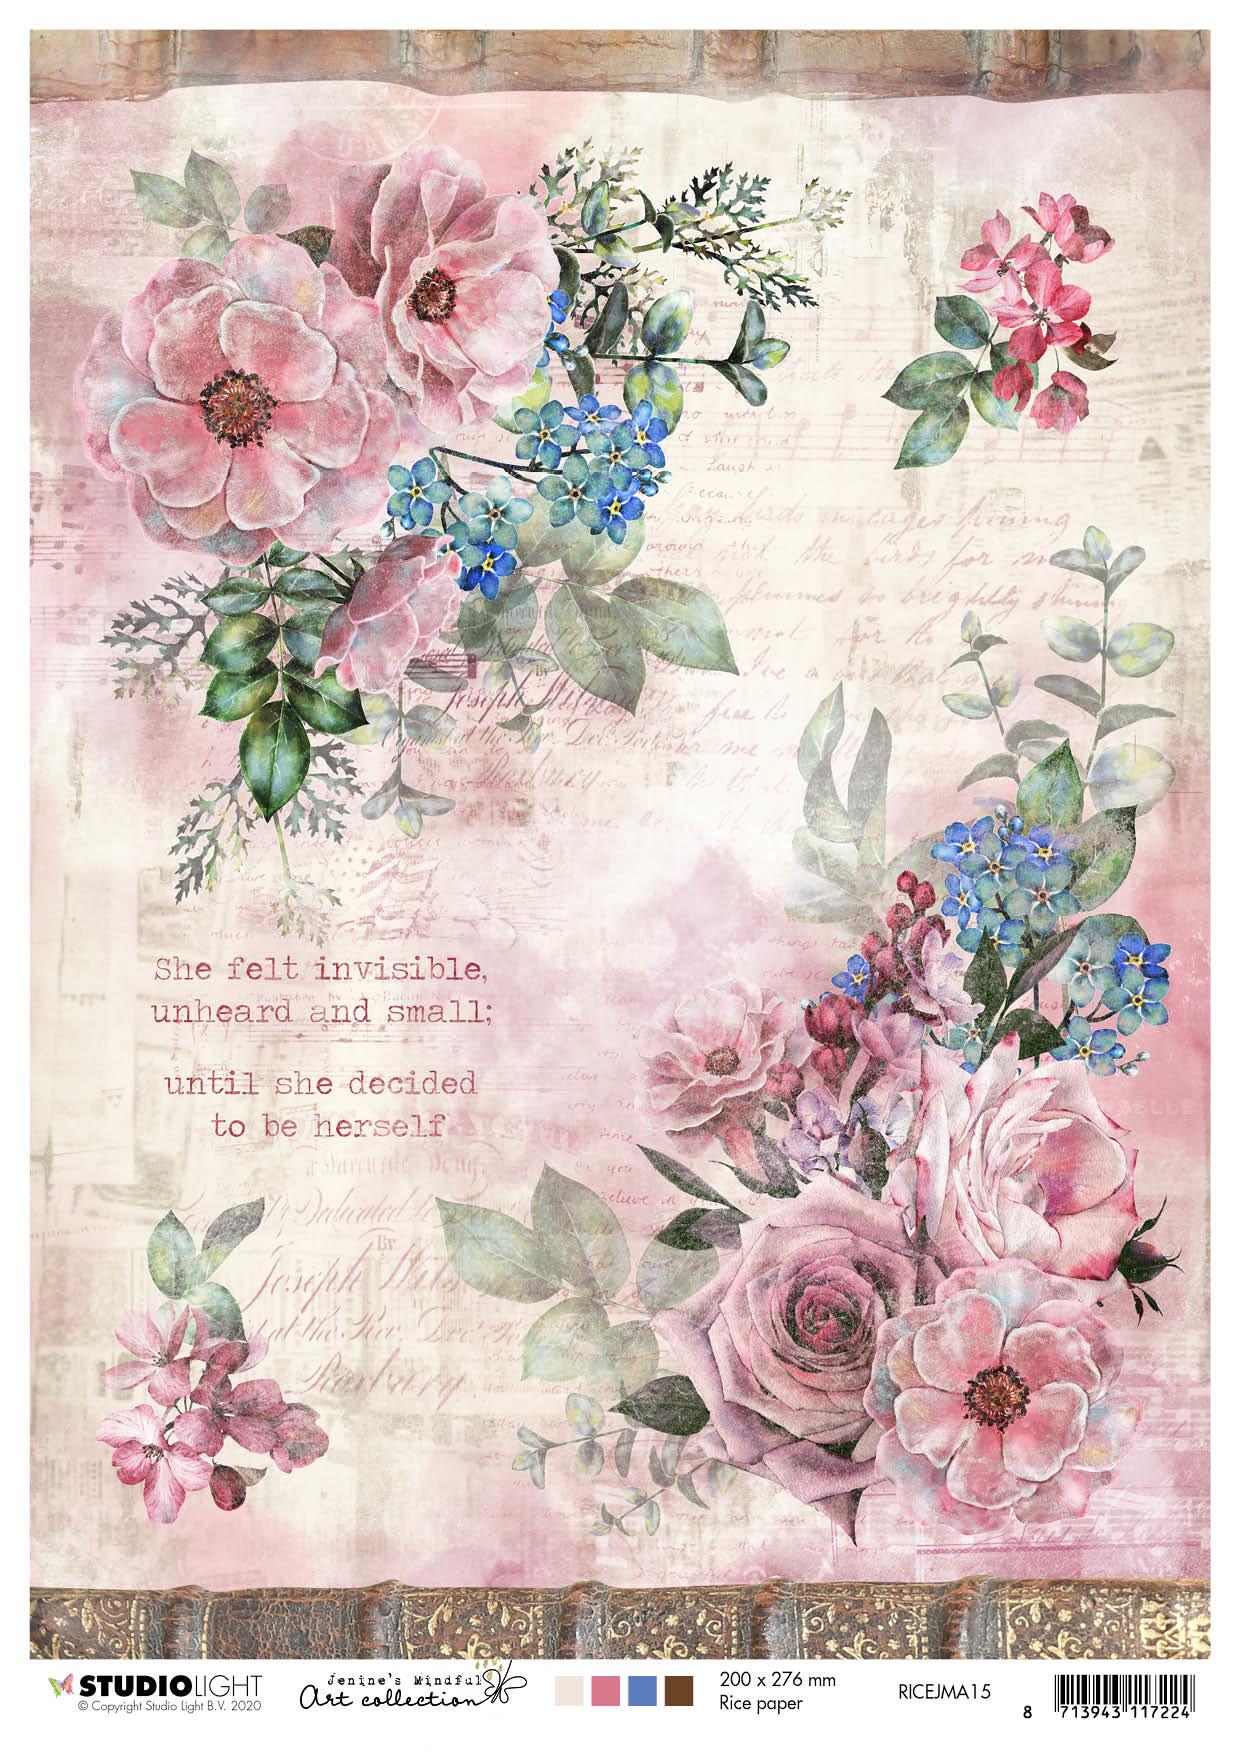 Studiolight Rice Paper A4 Sheet, Jenine's Mindful Art 3.0 nr.15